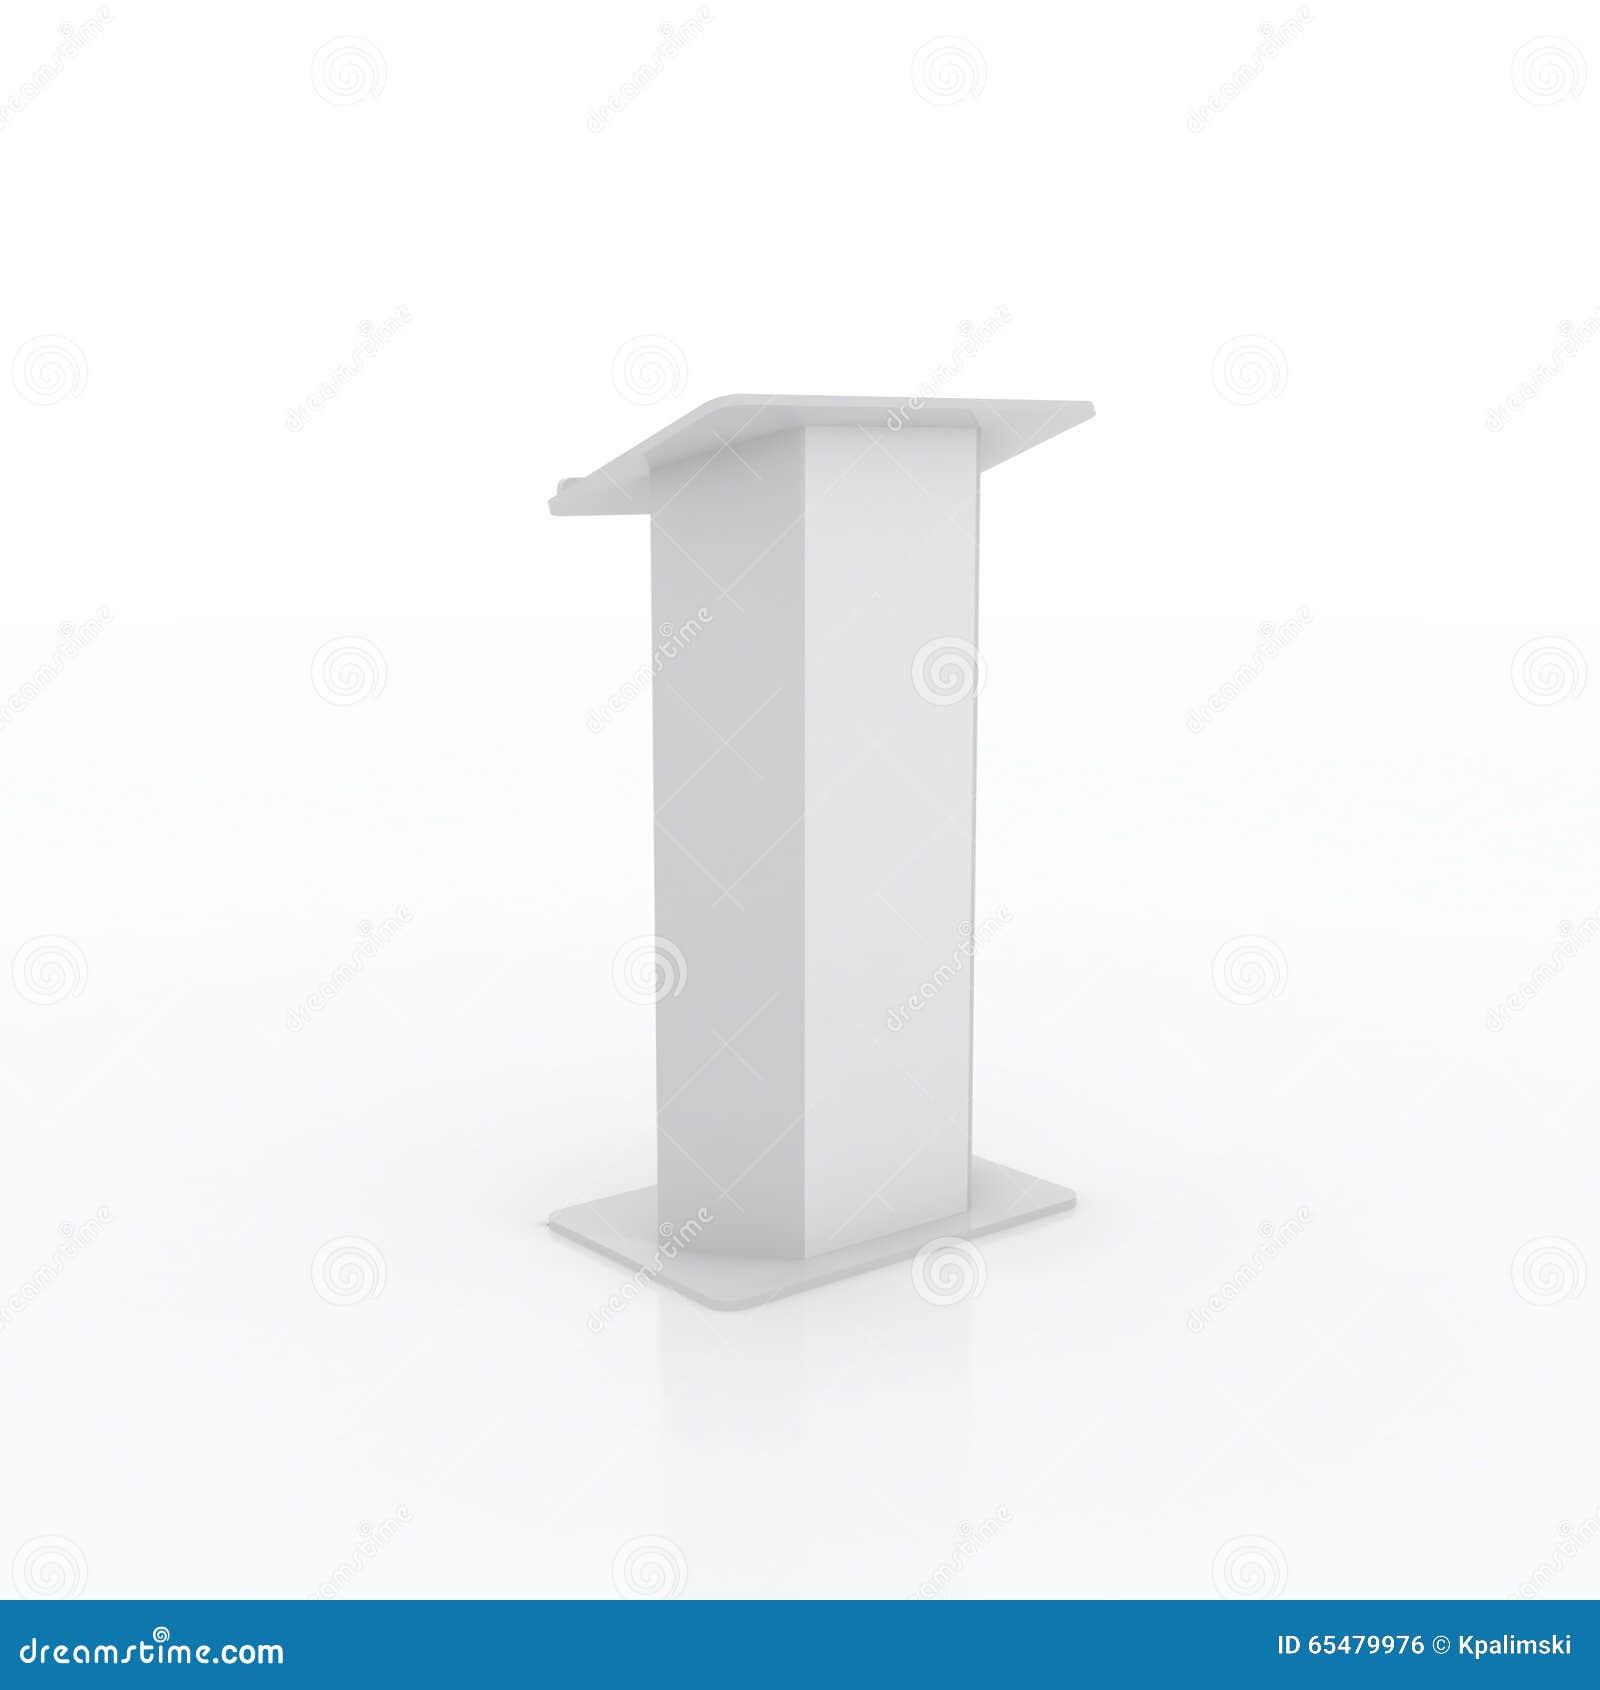 White Studio Background With Podium: White Podium Stock Illustration